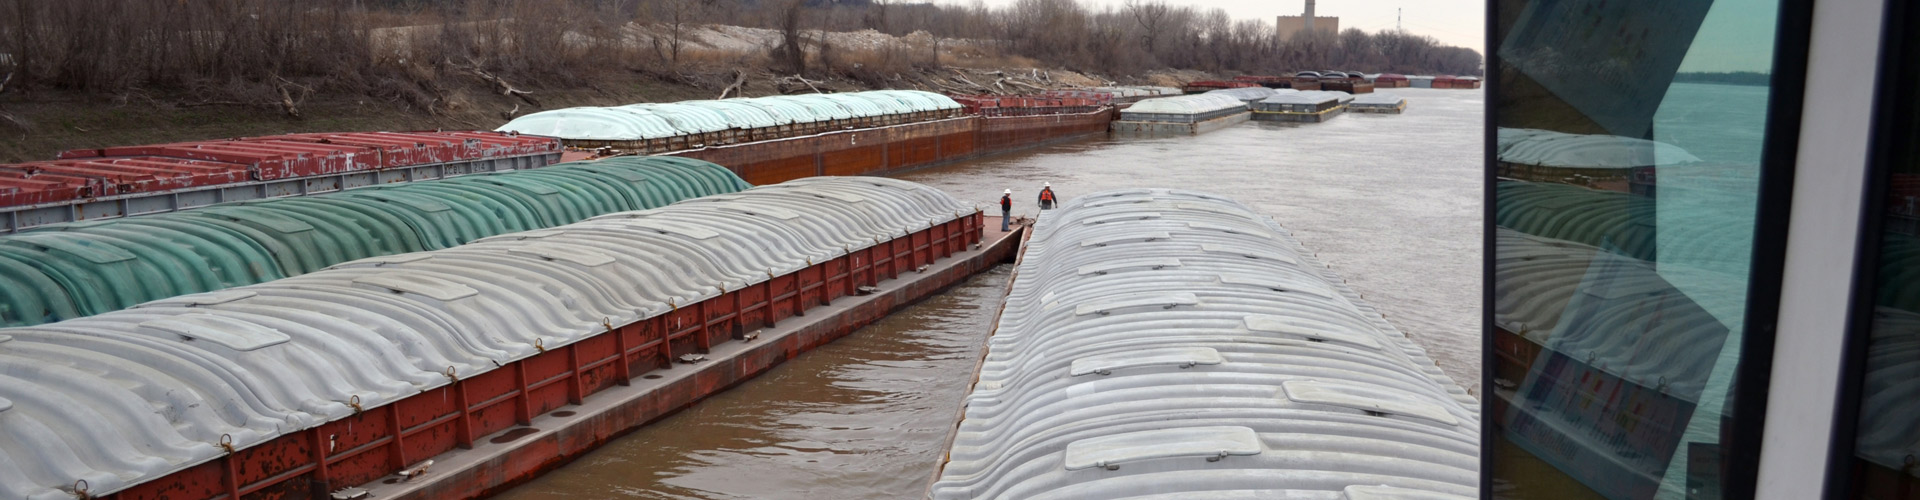 short haul towing, harbor management services, barge transportation, barge management solutions, intermodal transport, Upper Mississippi River barges, river logistics, inland waterway services